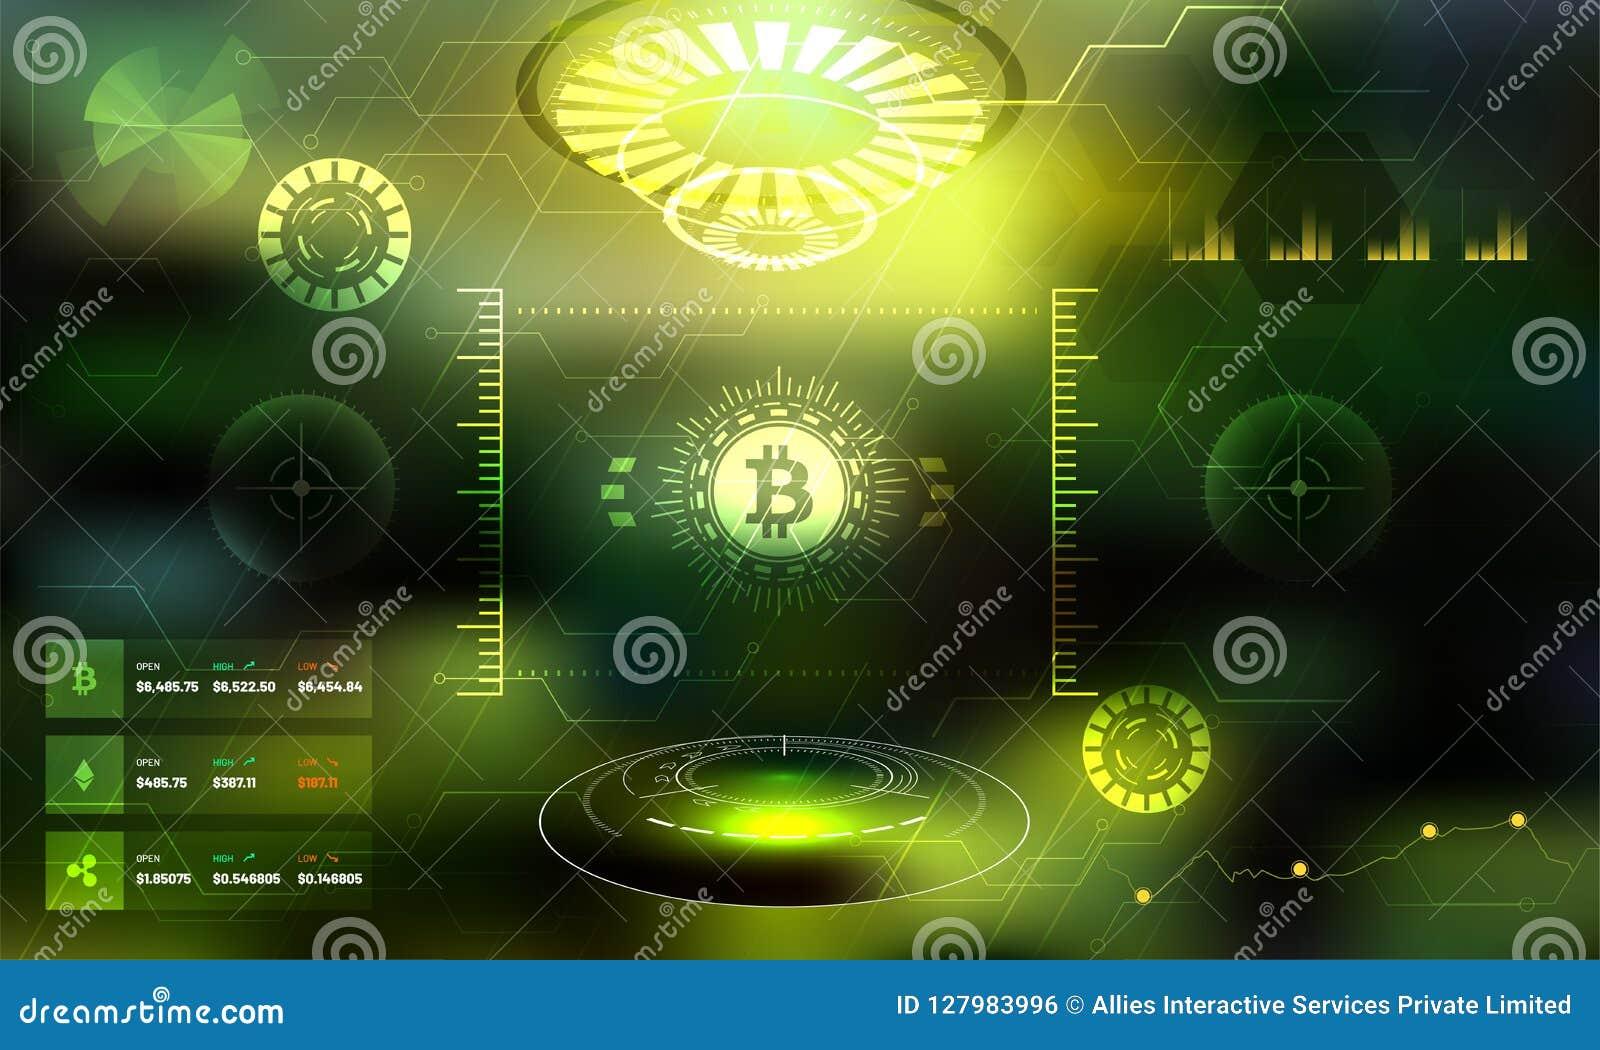 Bitcoin Trading Sci-fi User Interface HUD Background